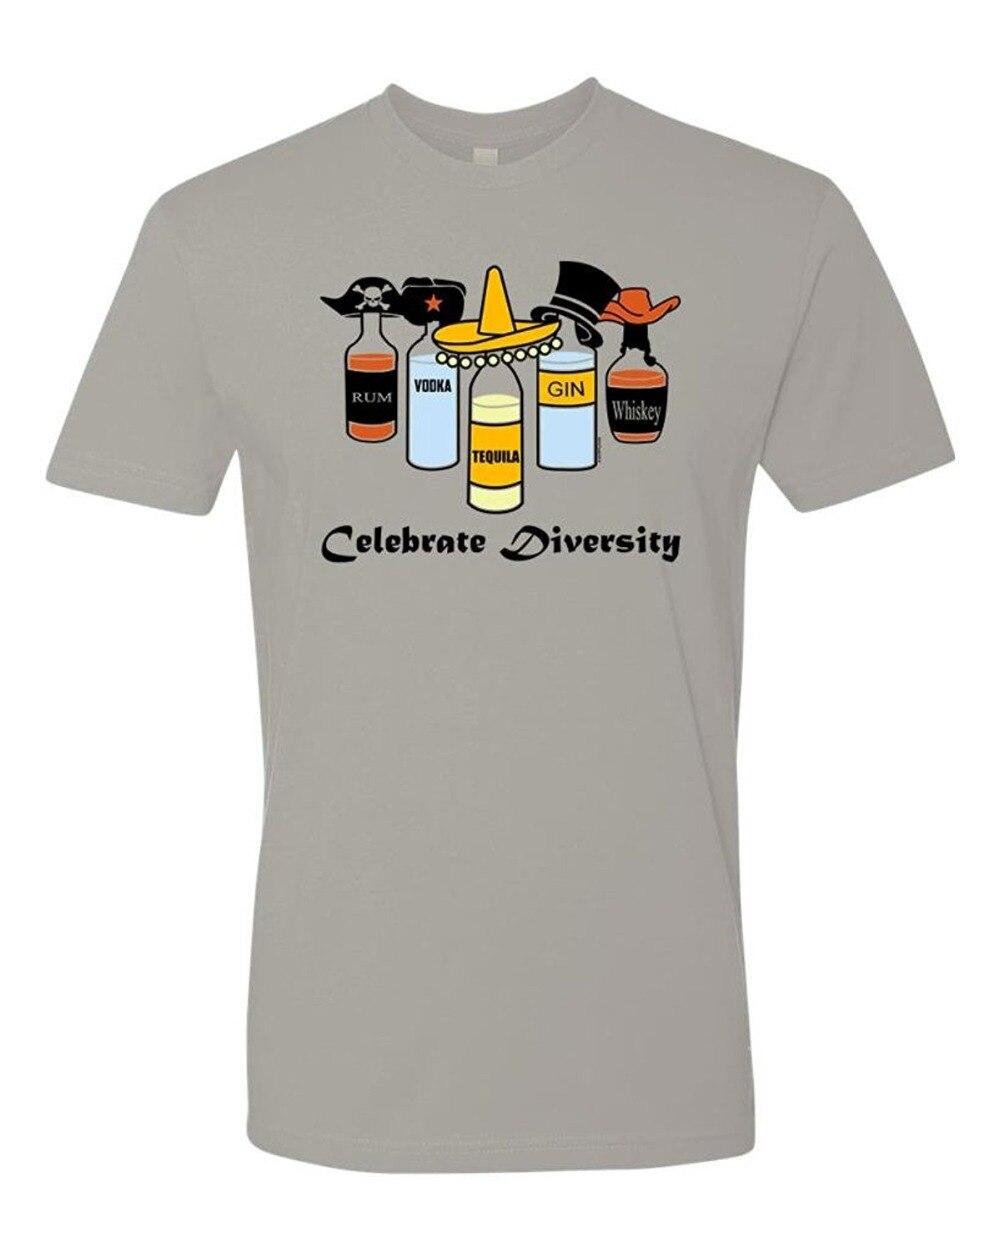 Tee Shirt Printing Design Men Crew Neck Celebtrate Diversity Alcohol Short Sleeve T Shirts